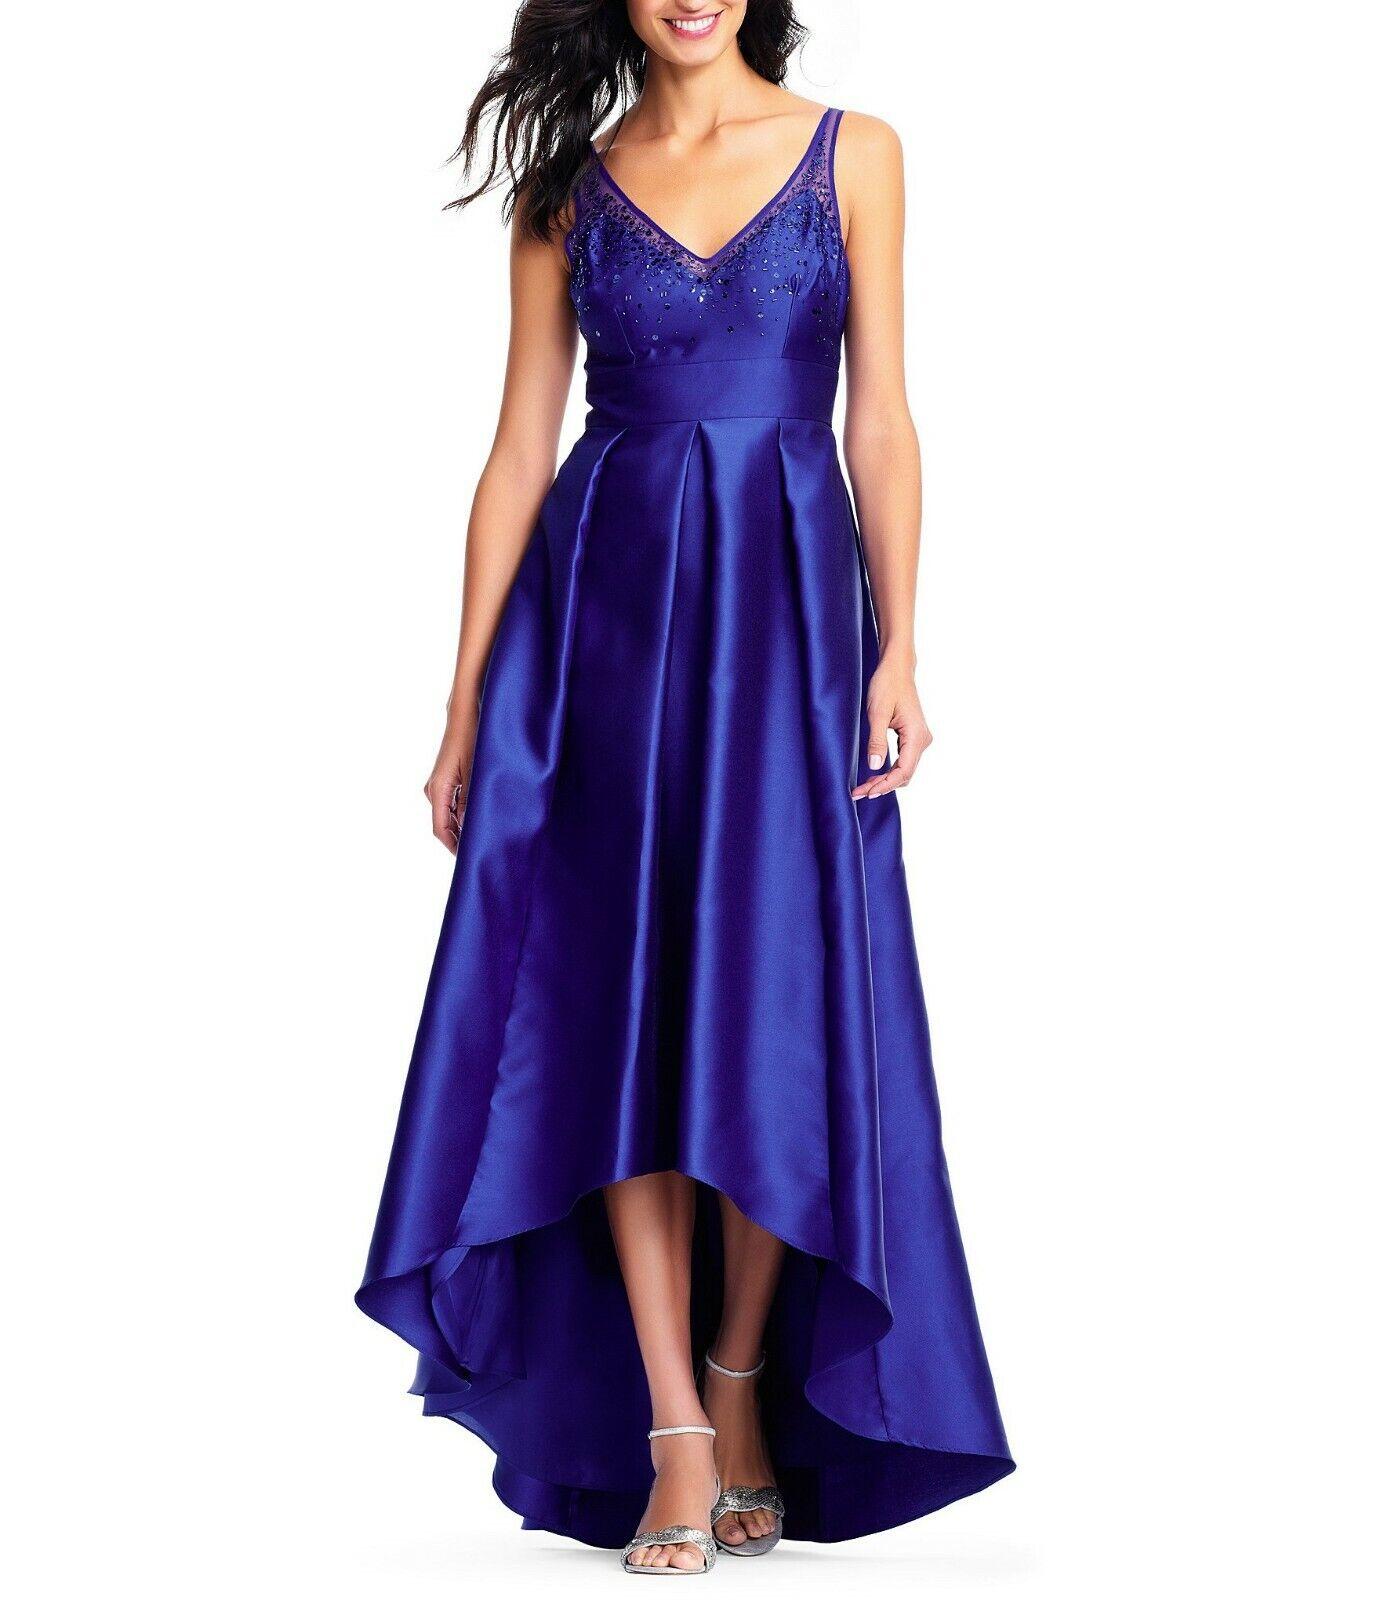 Adrianna Papell High Low Ball Gown  229   Größe 4 A 202 NEW